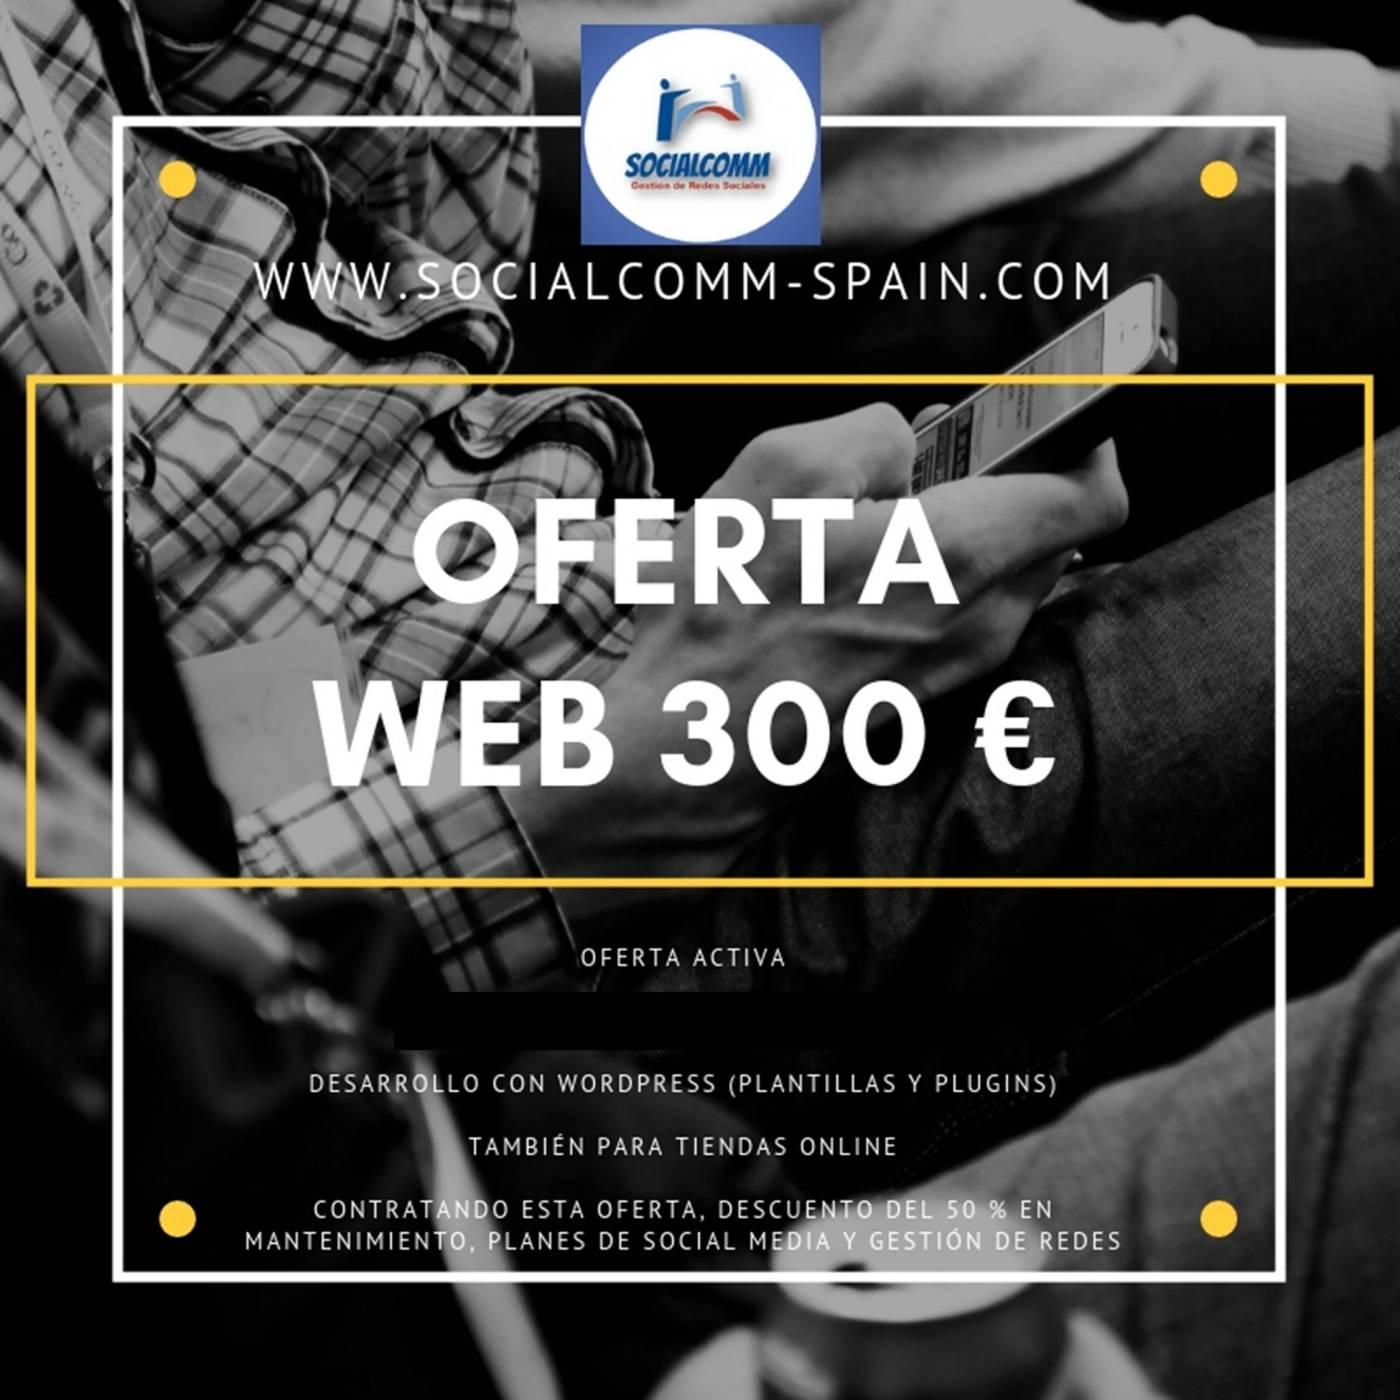 oferta web 300 | SocialcoMM